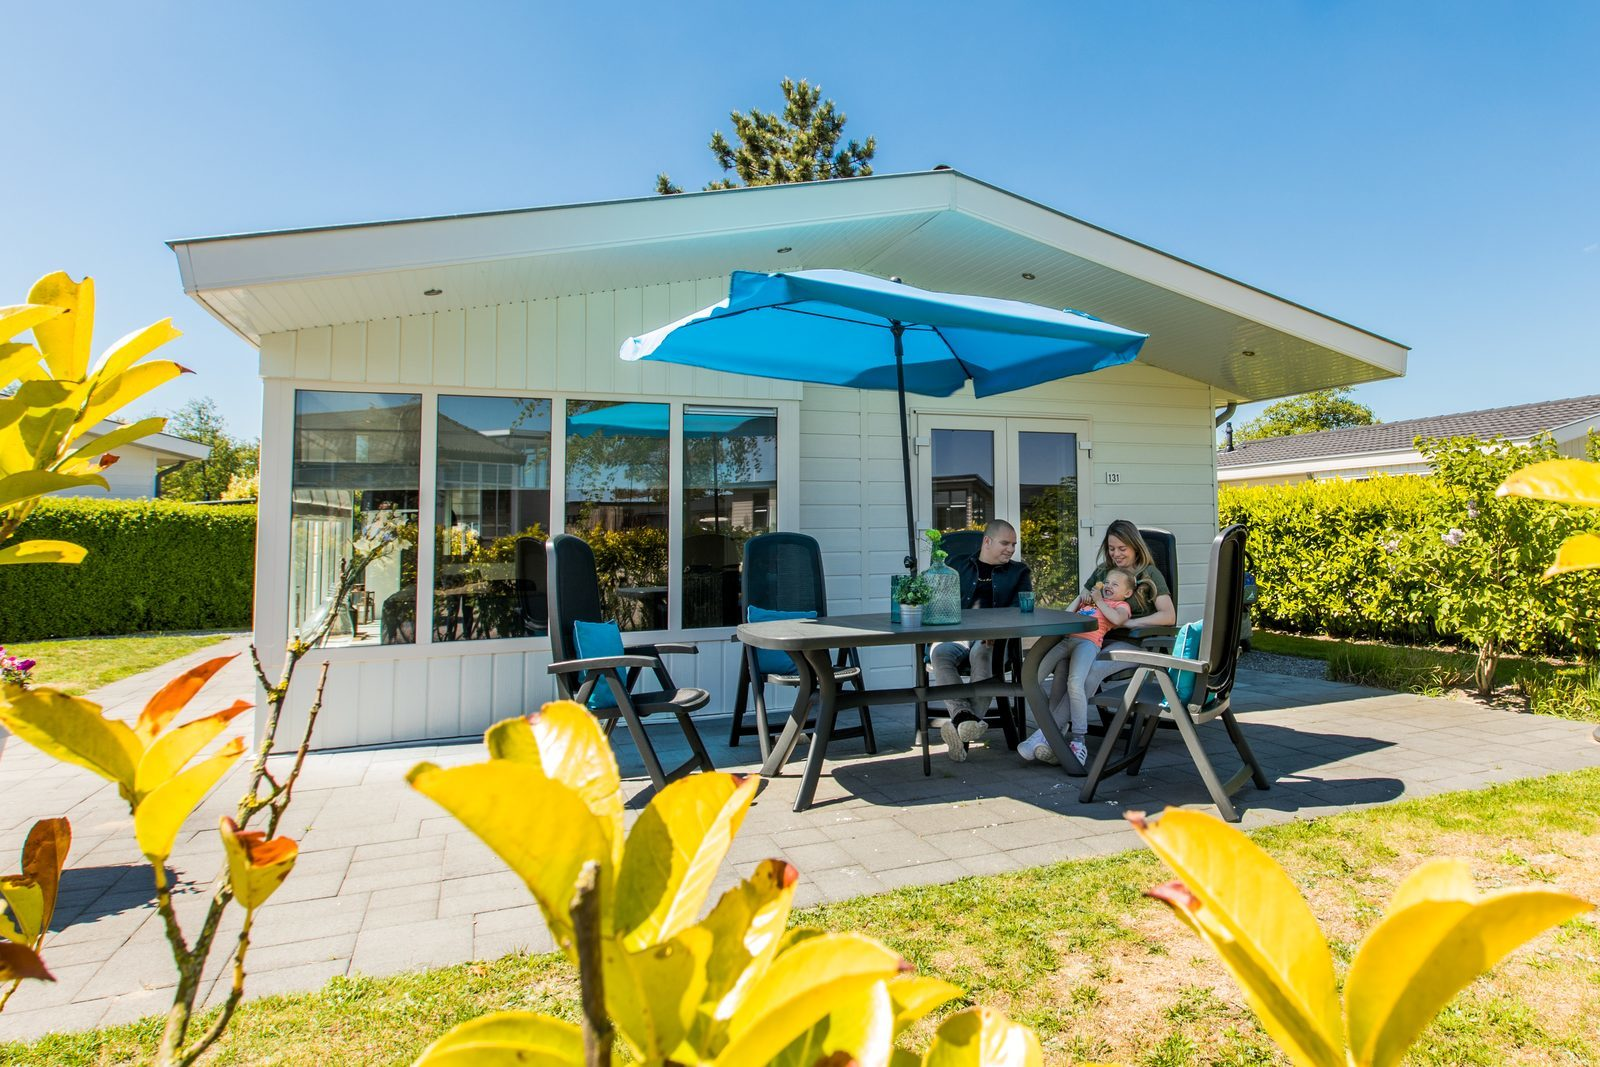 Beachhouse | Private Nutzung